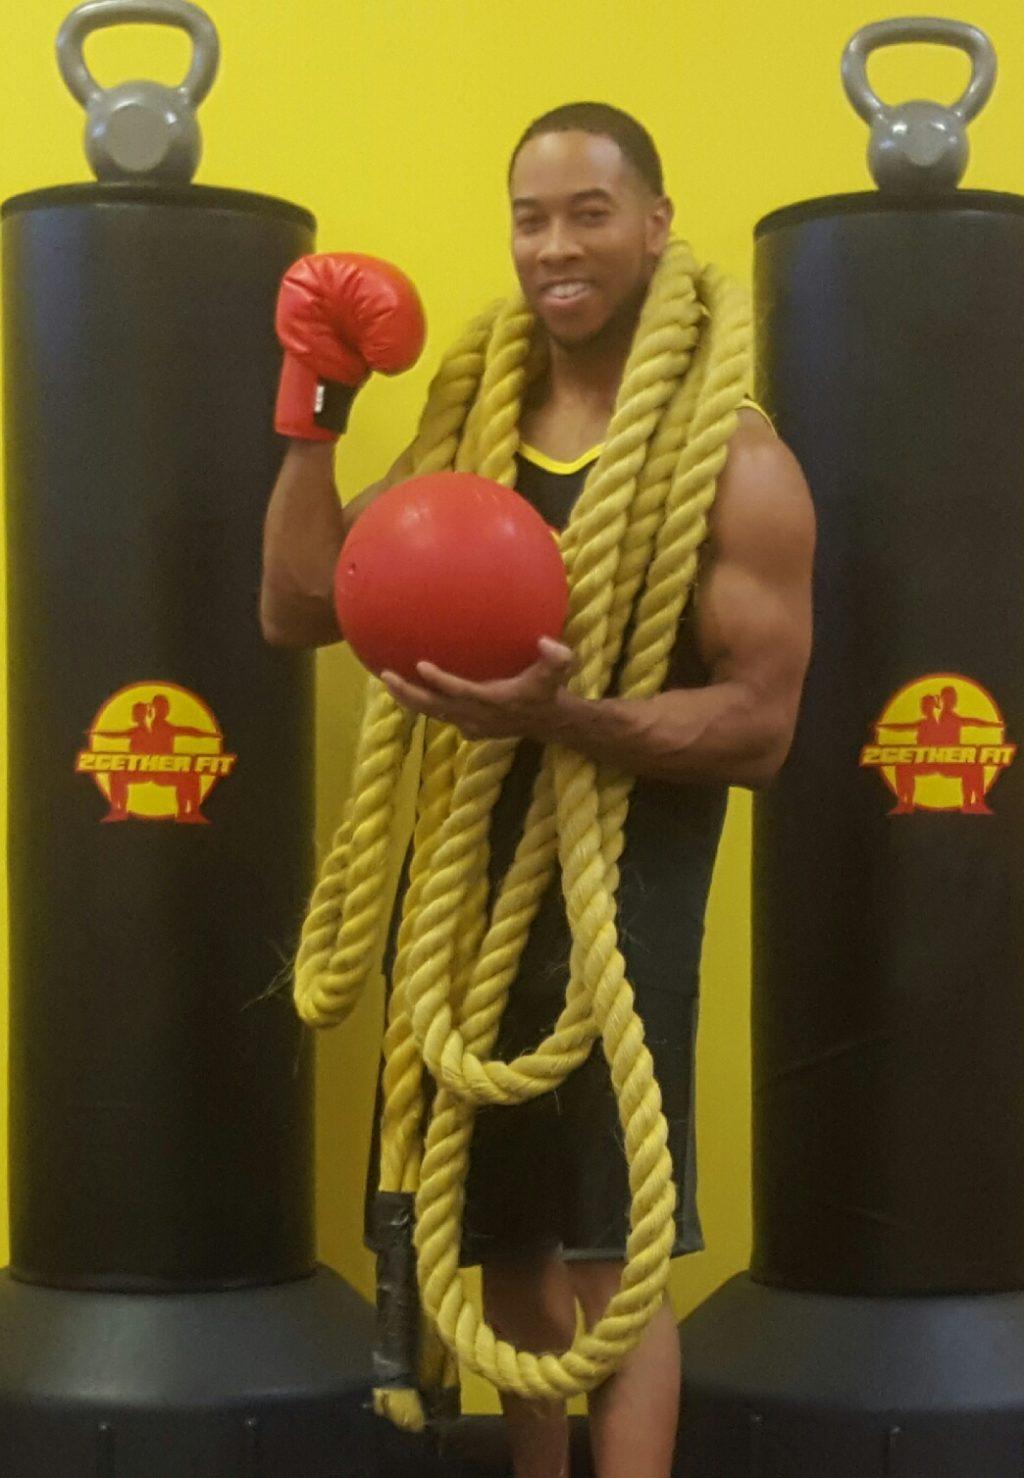 Personal Trainer Houston, Texas - Brandon Thomas